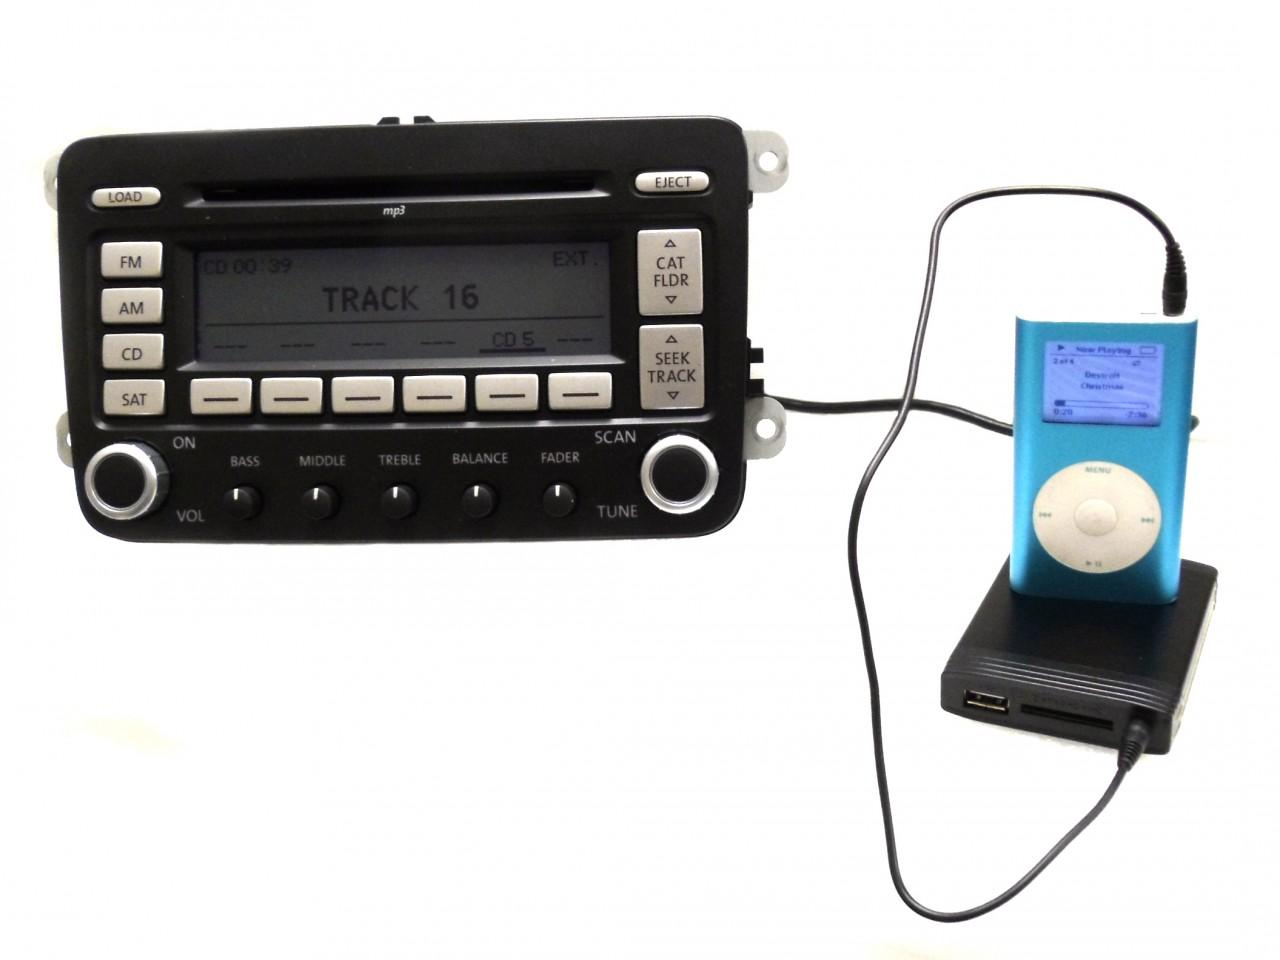 volkswagen vw jetta passat golf ipod auxiliary adapter harness mp usb interface ebay